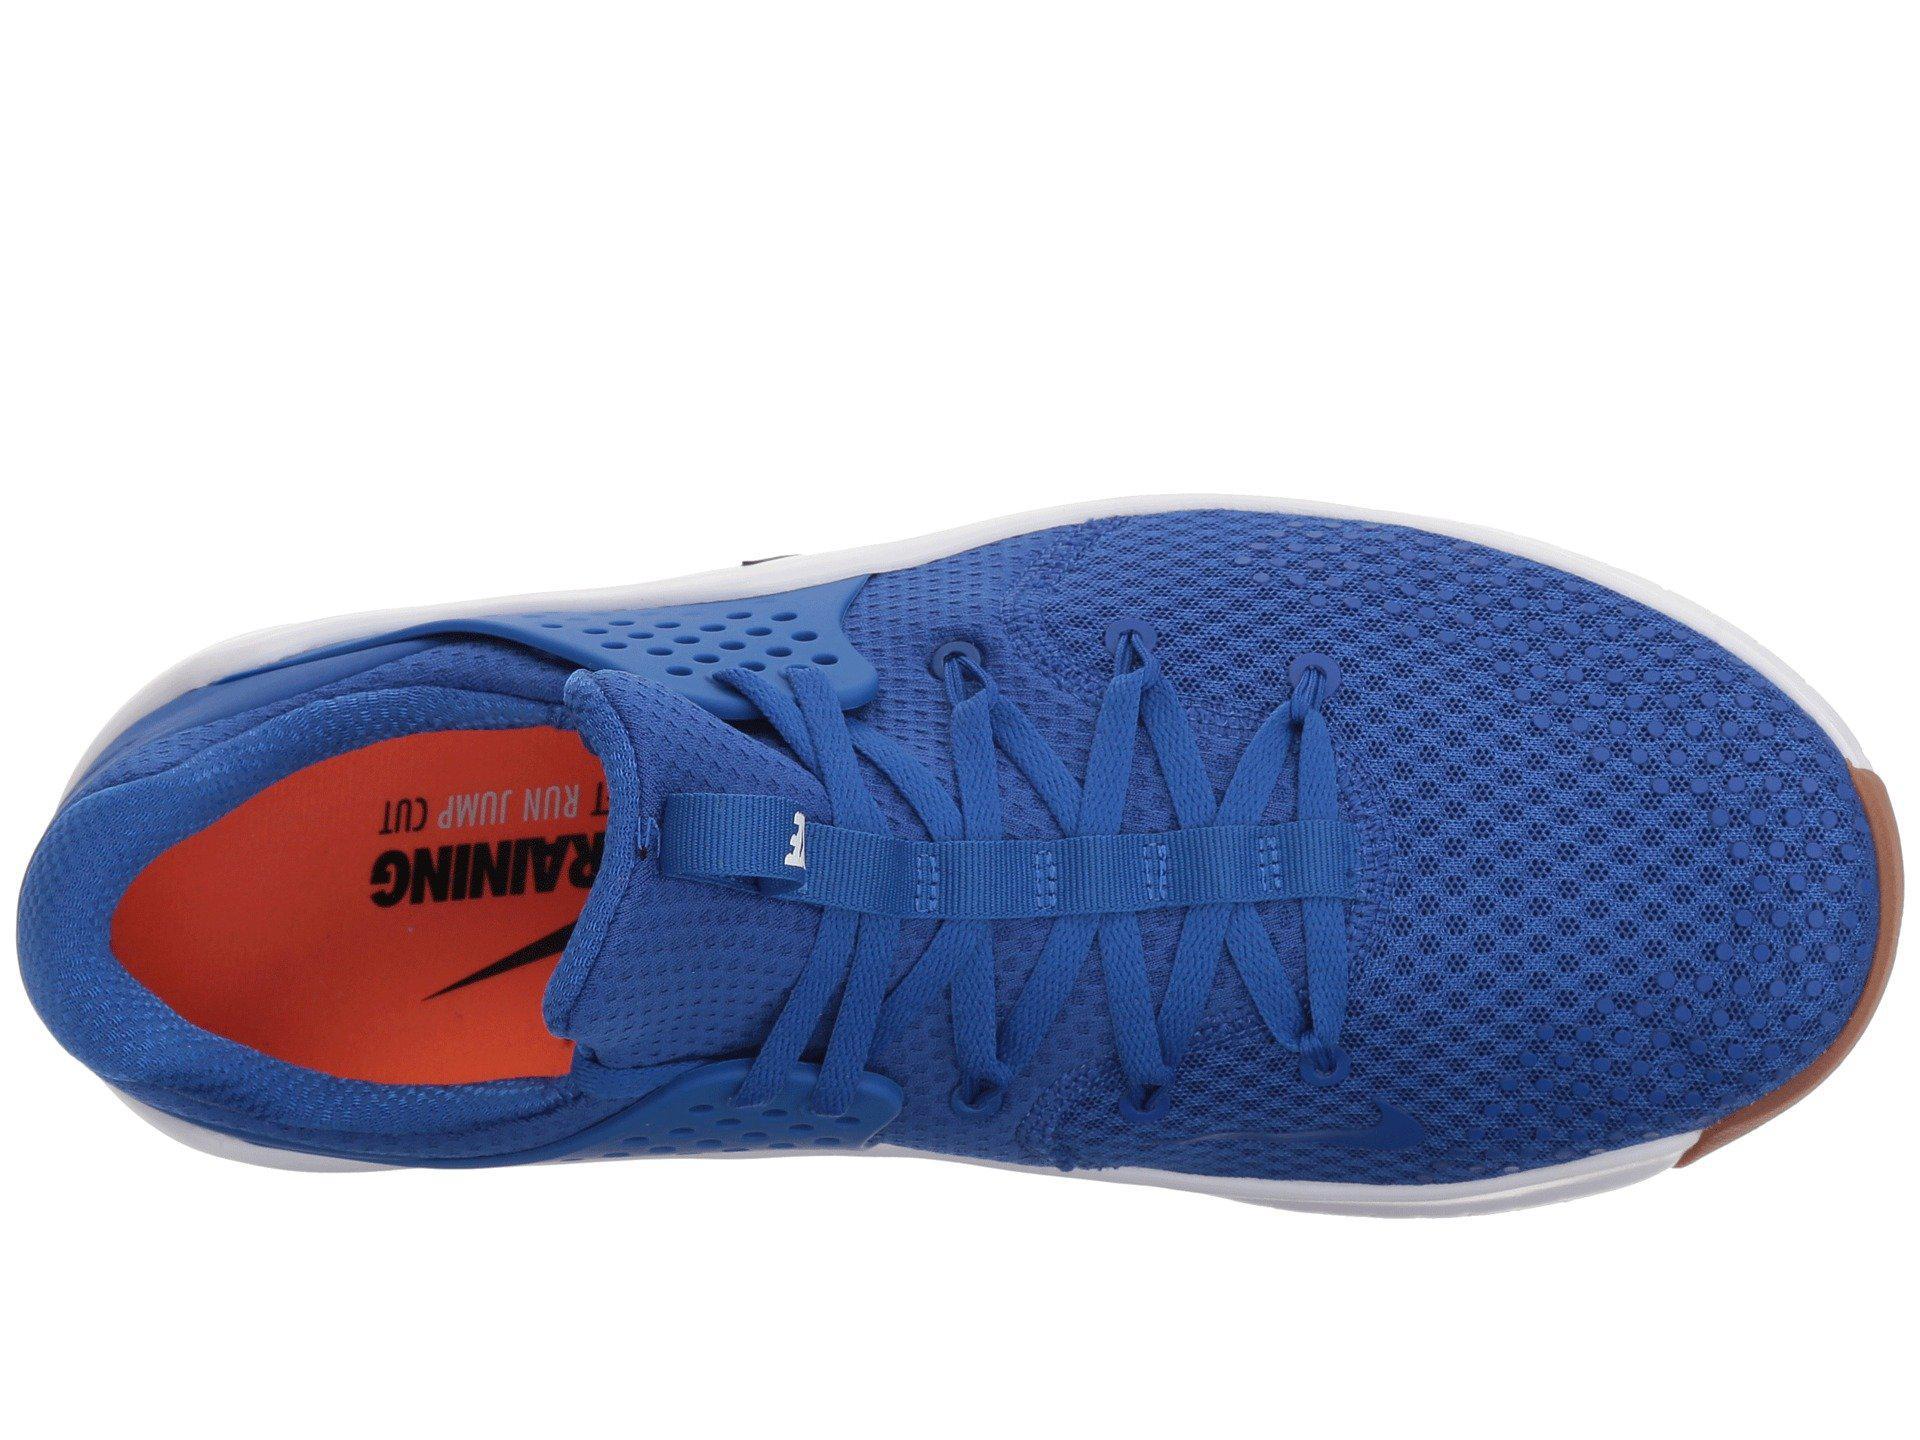 19c4712b18a0 Nike Free blackwhitered V8 Cross Lyst Blaze Men s Trainer TxqdWIwv